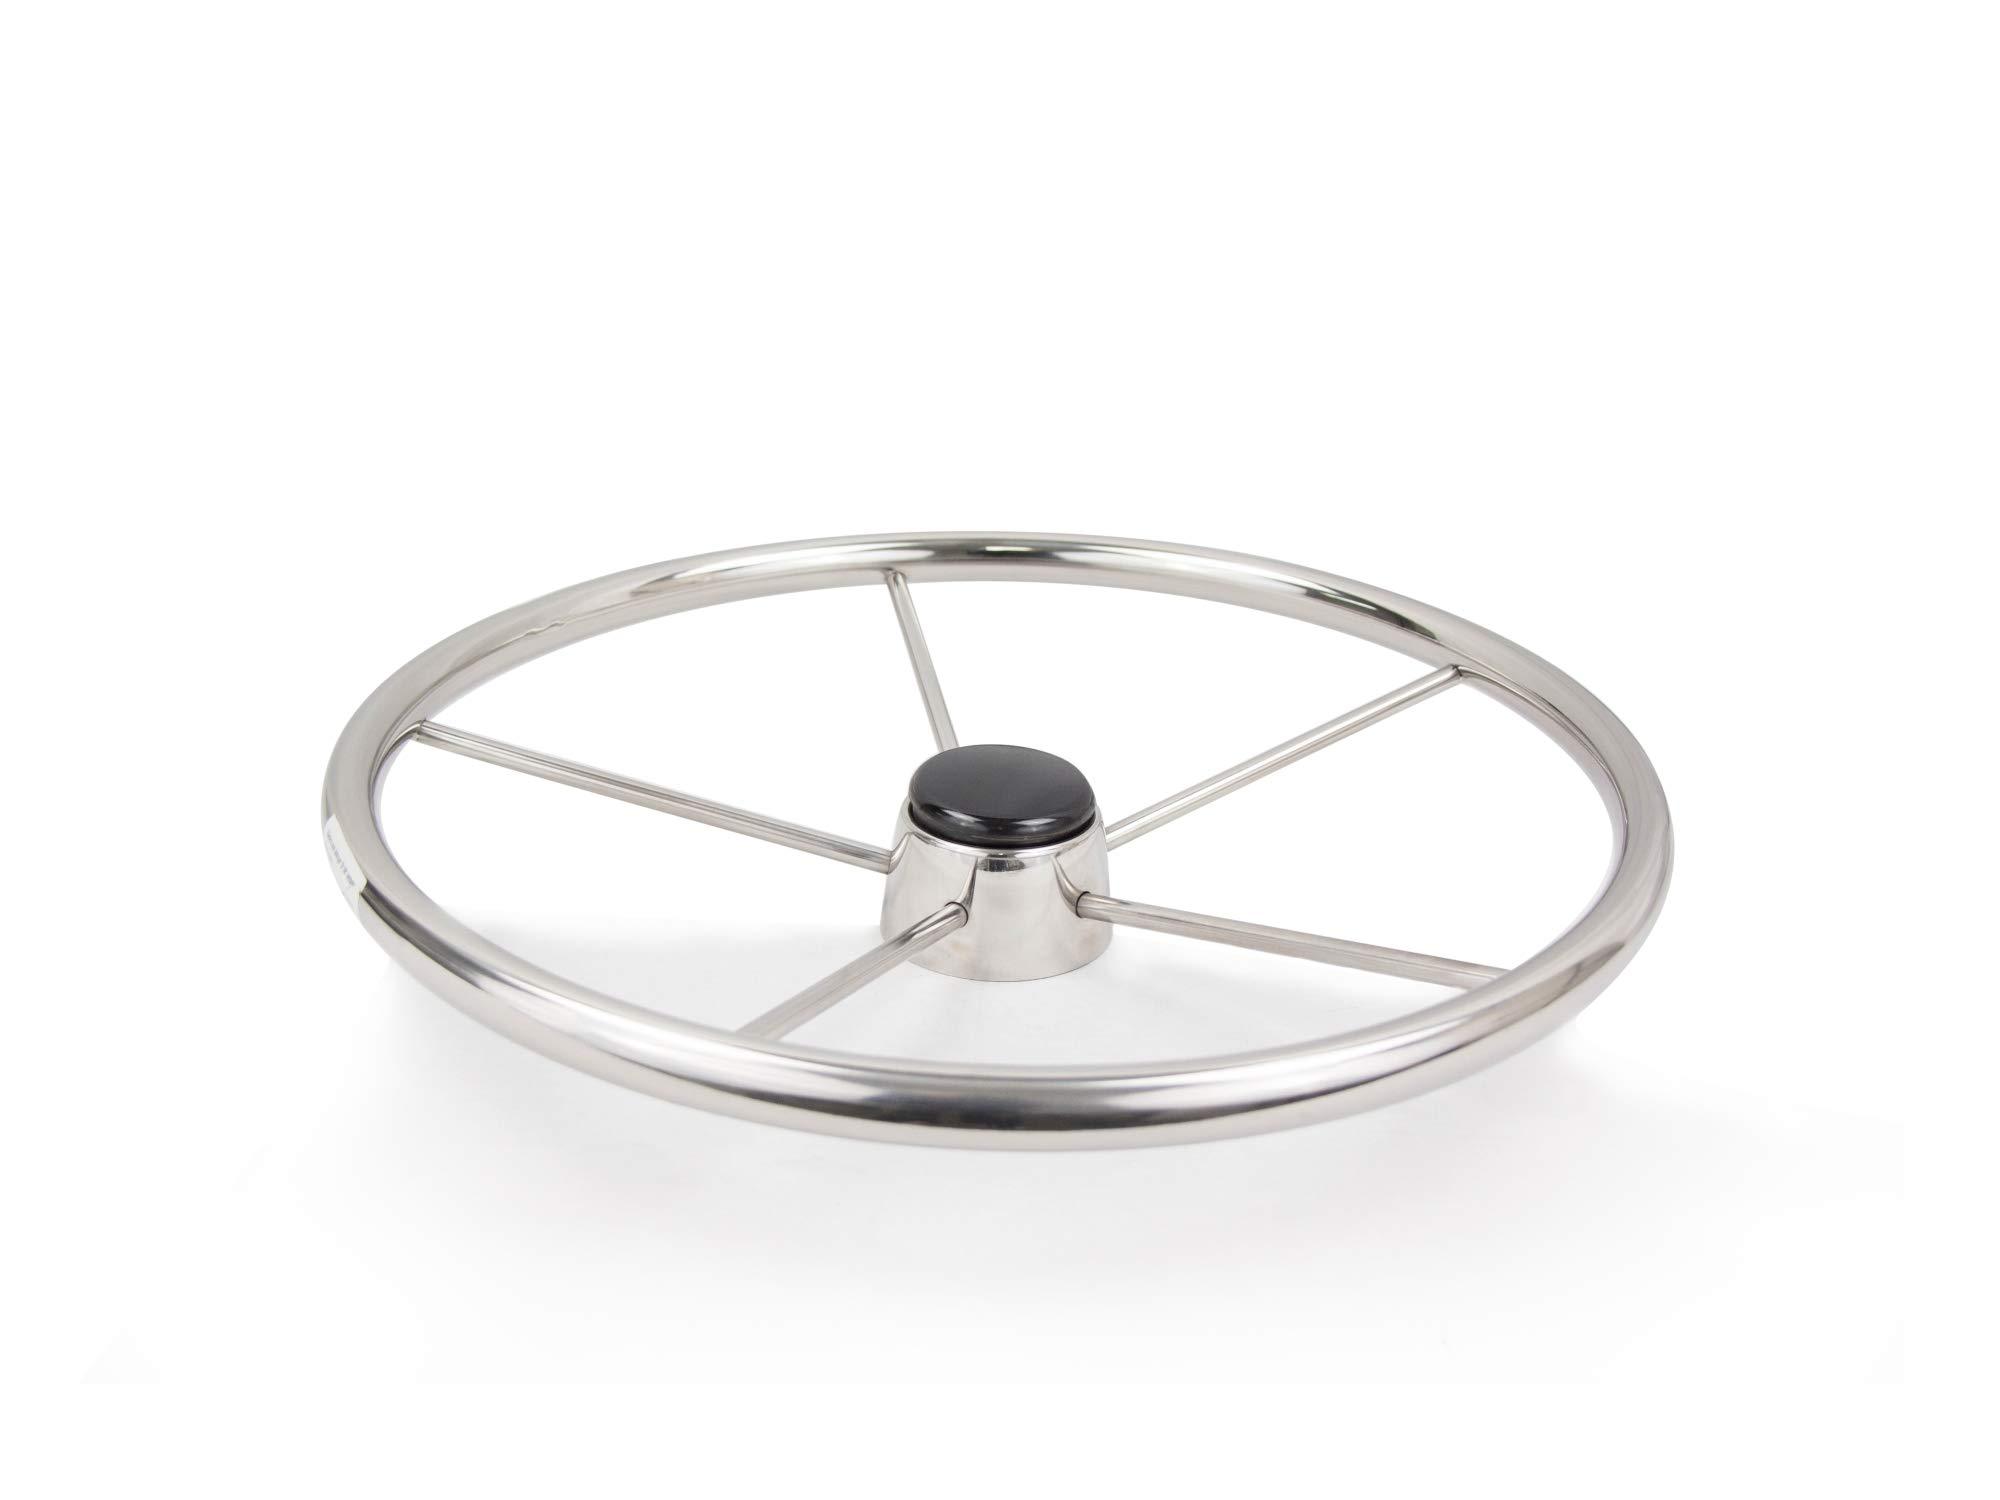 Five Oceans Stainless Steel Destroyer Wheel, 15'' FO-1519 by Five Oceans